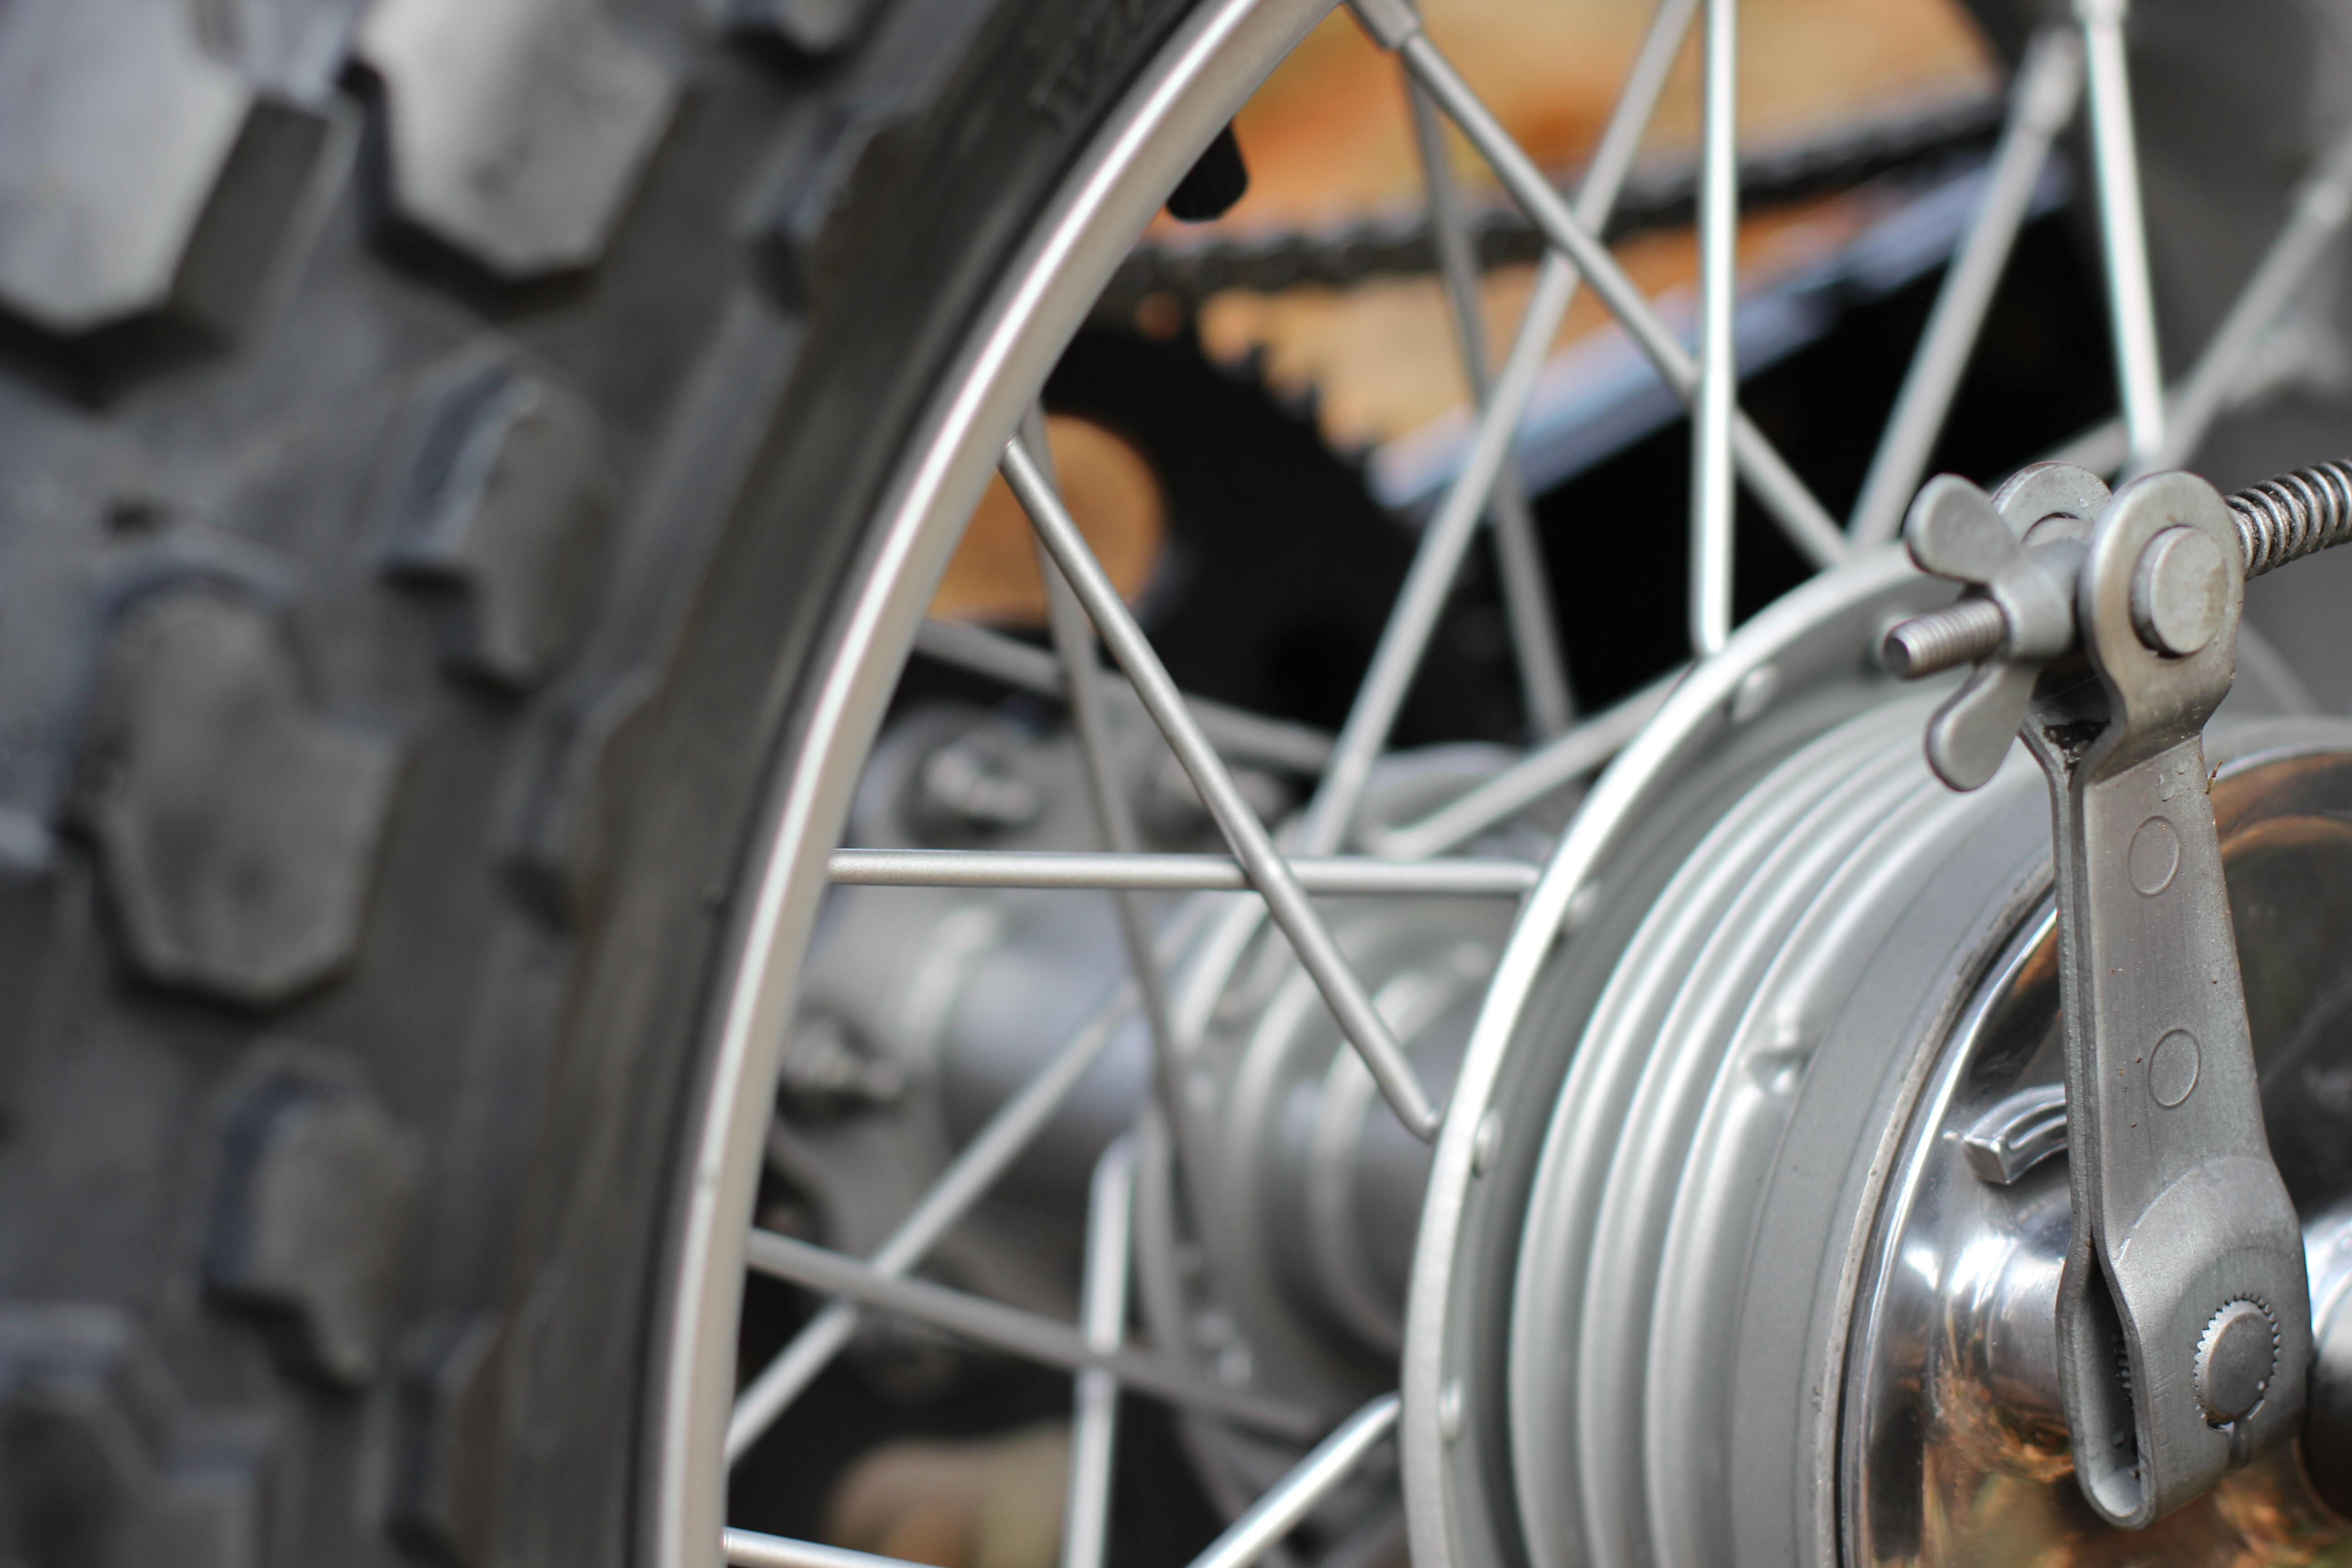 Red TU125 front wheel